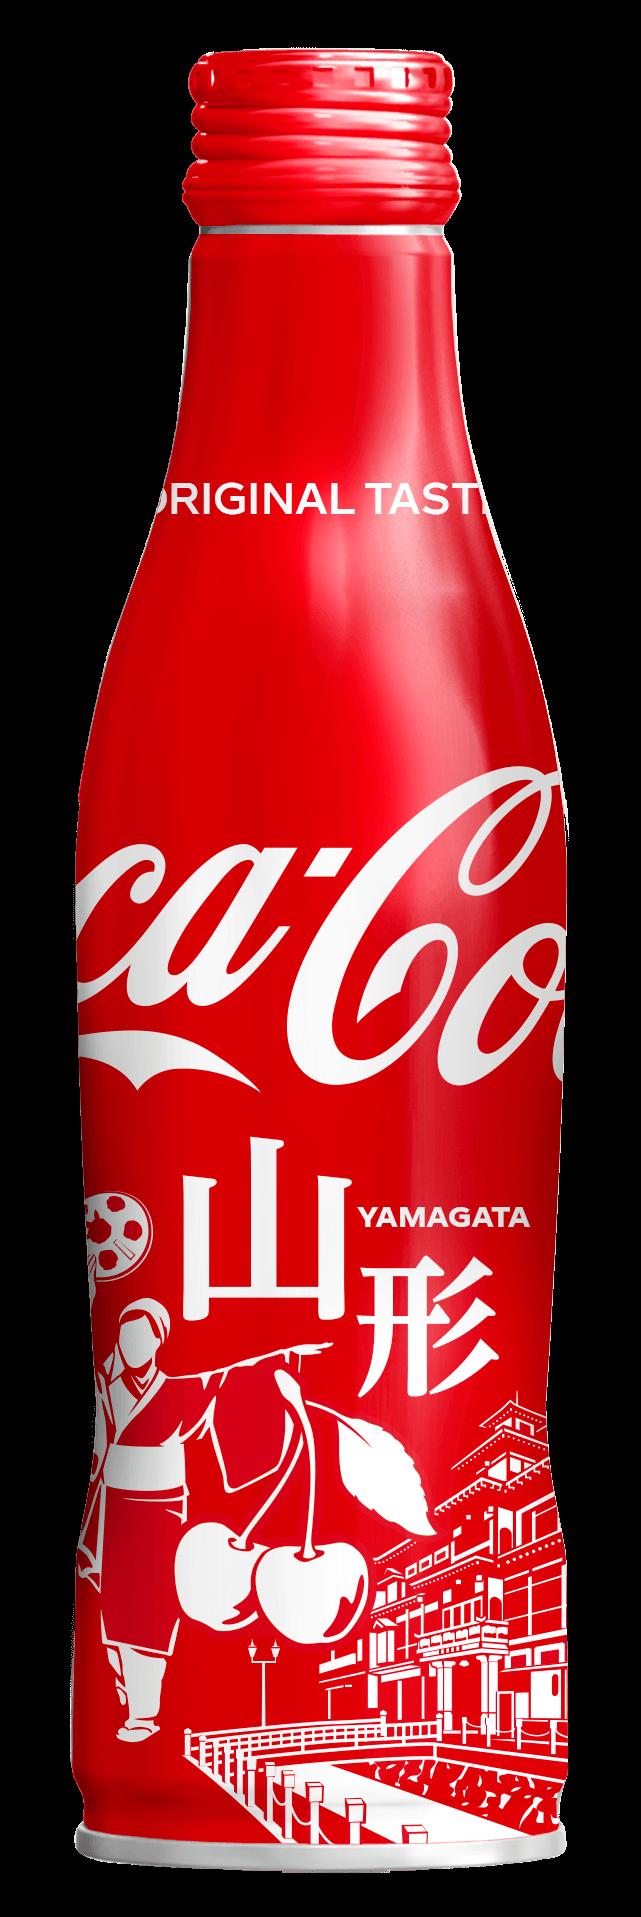 2020 Coca Cola Japan Fukui  Limited Slim bottle Full !!